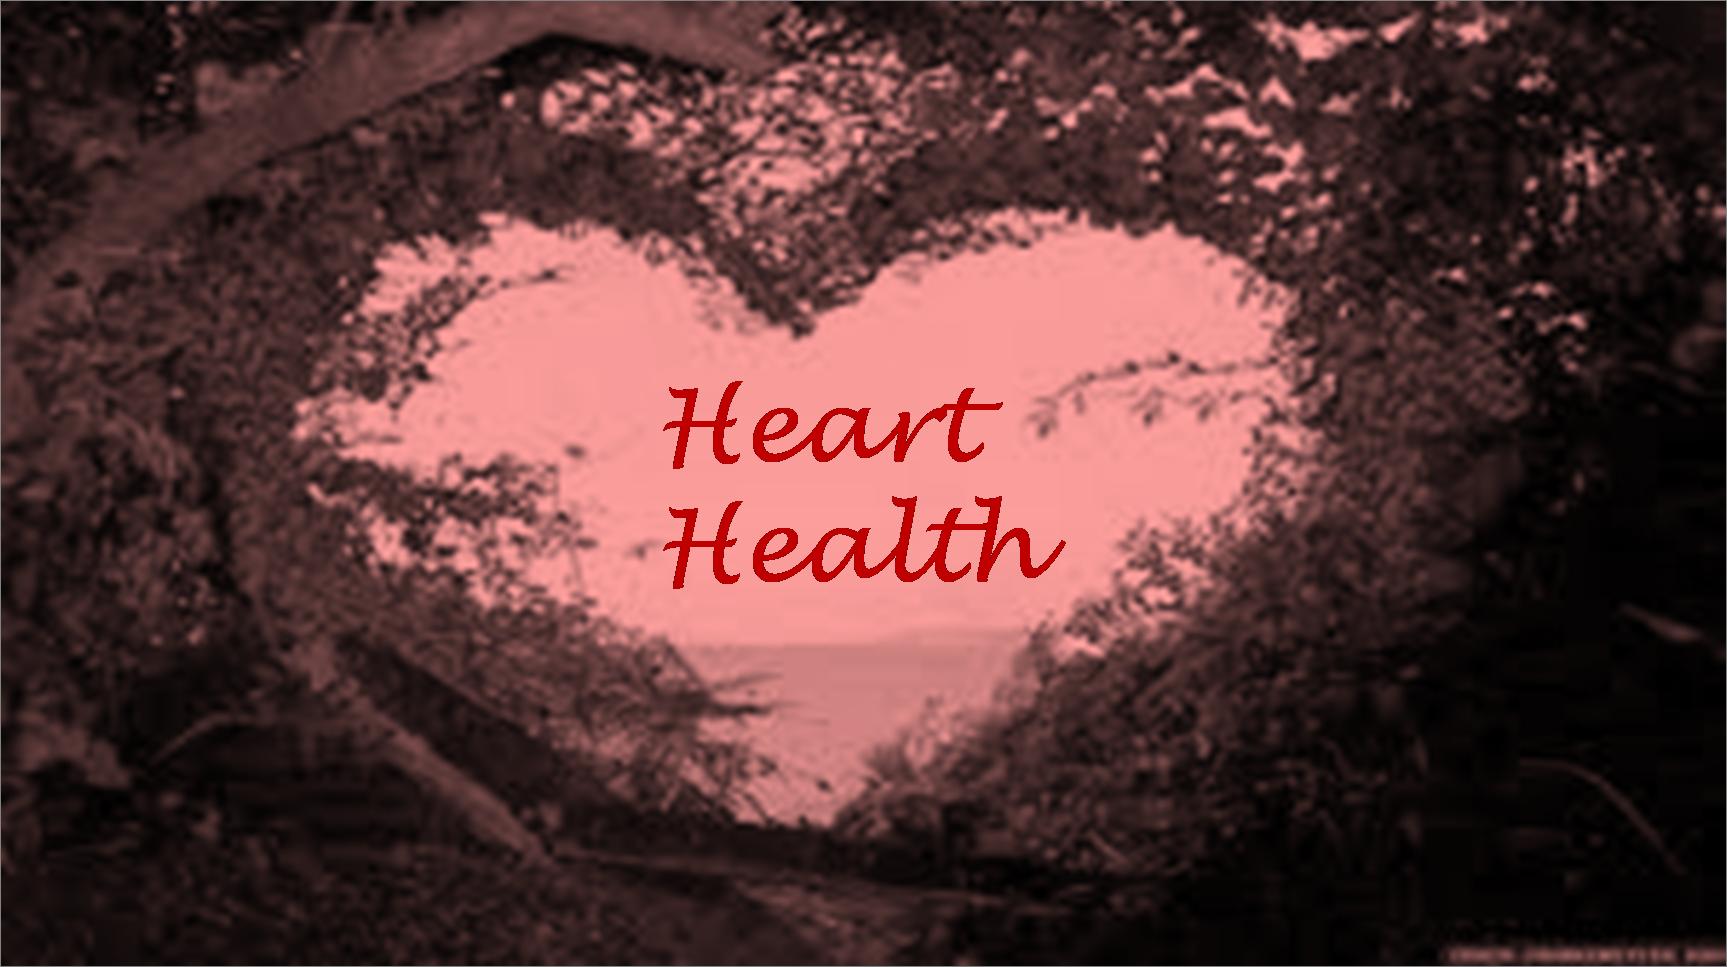 Regular Blood Flow Ensures Good Heart Health